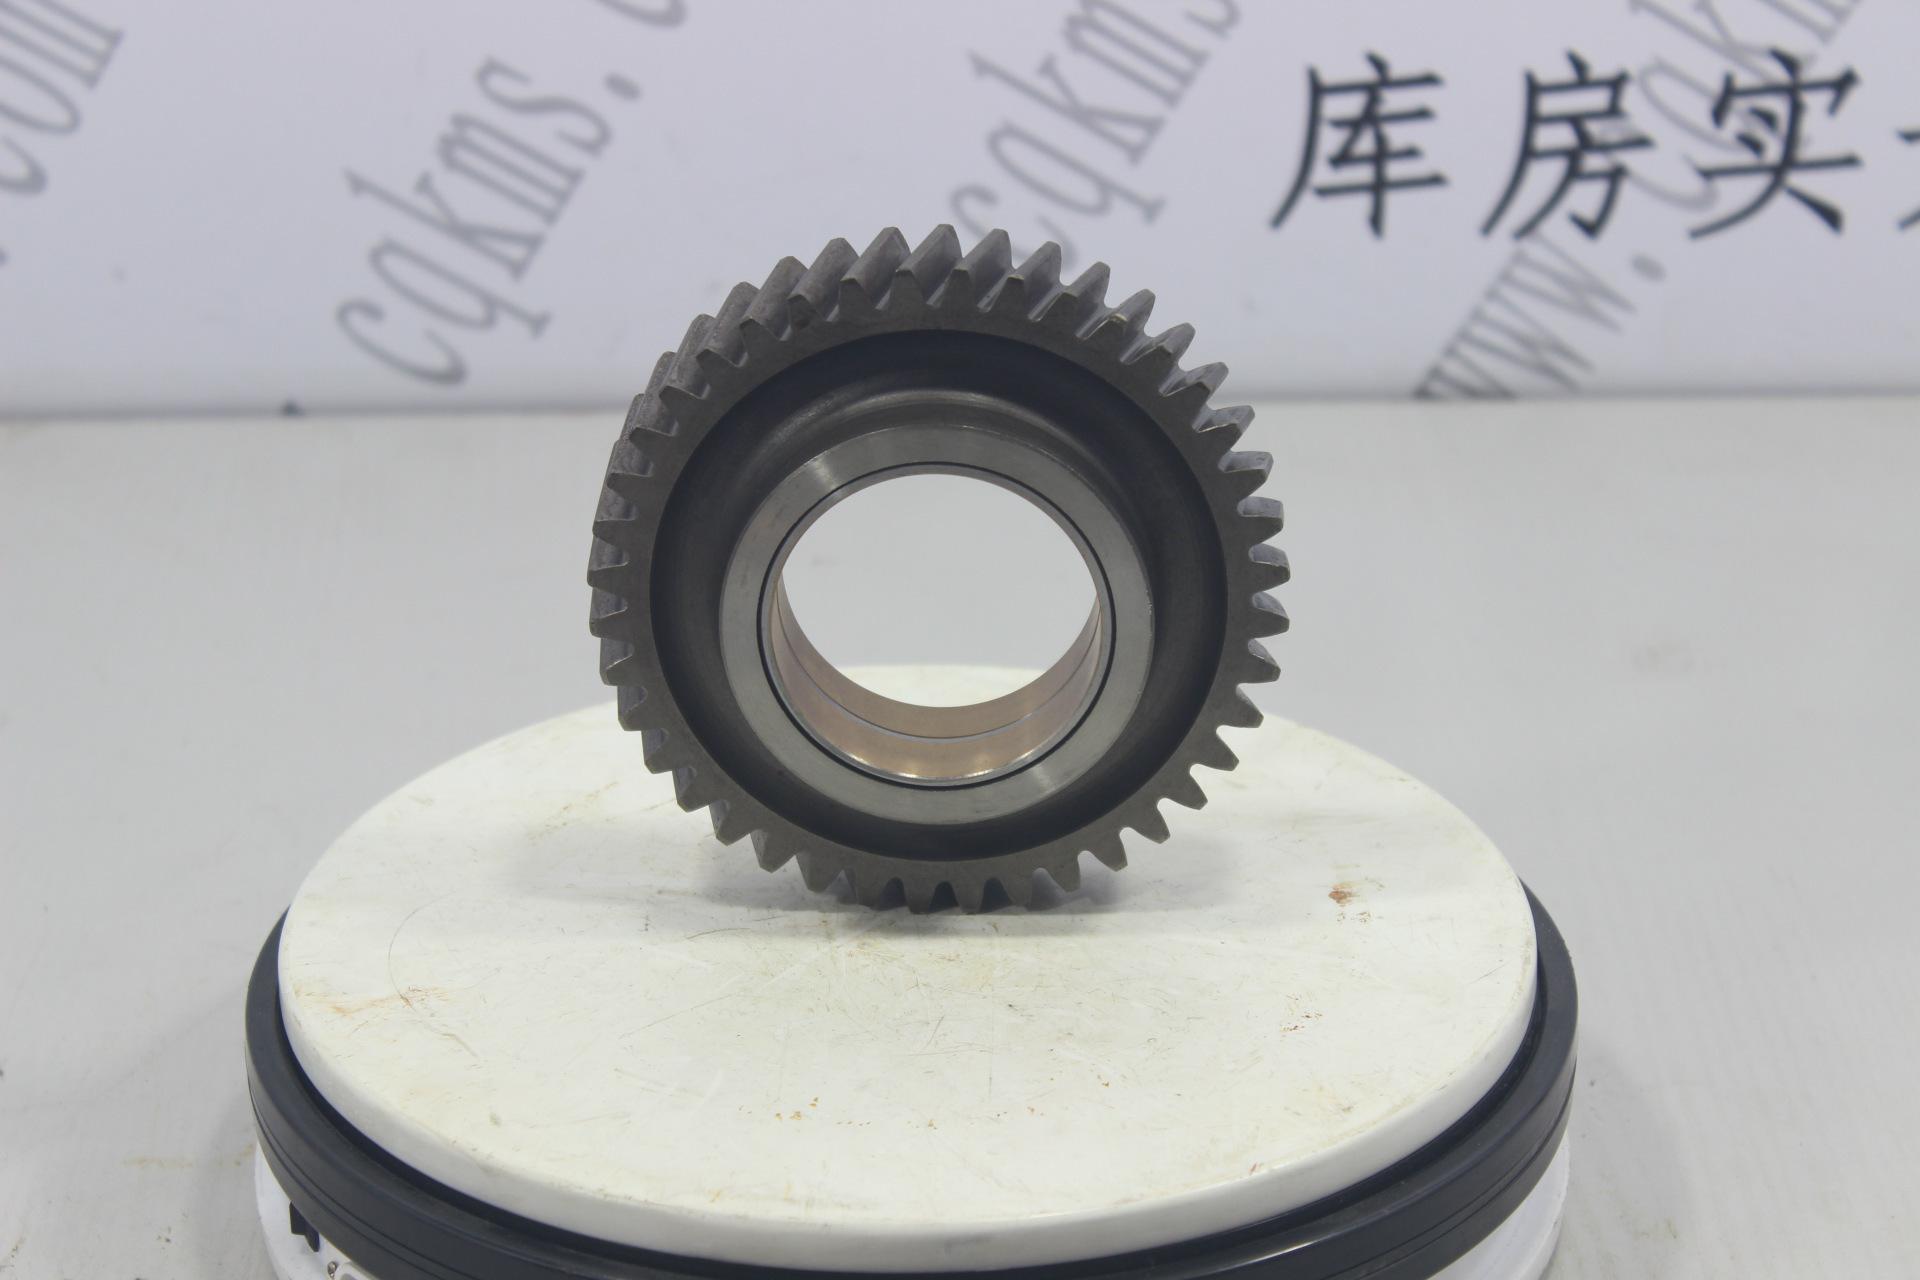 kms00889-3045873-惰齿轮----参考重量1.6Kg-1.6Kg图片1